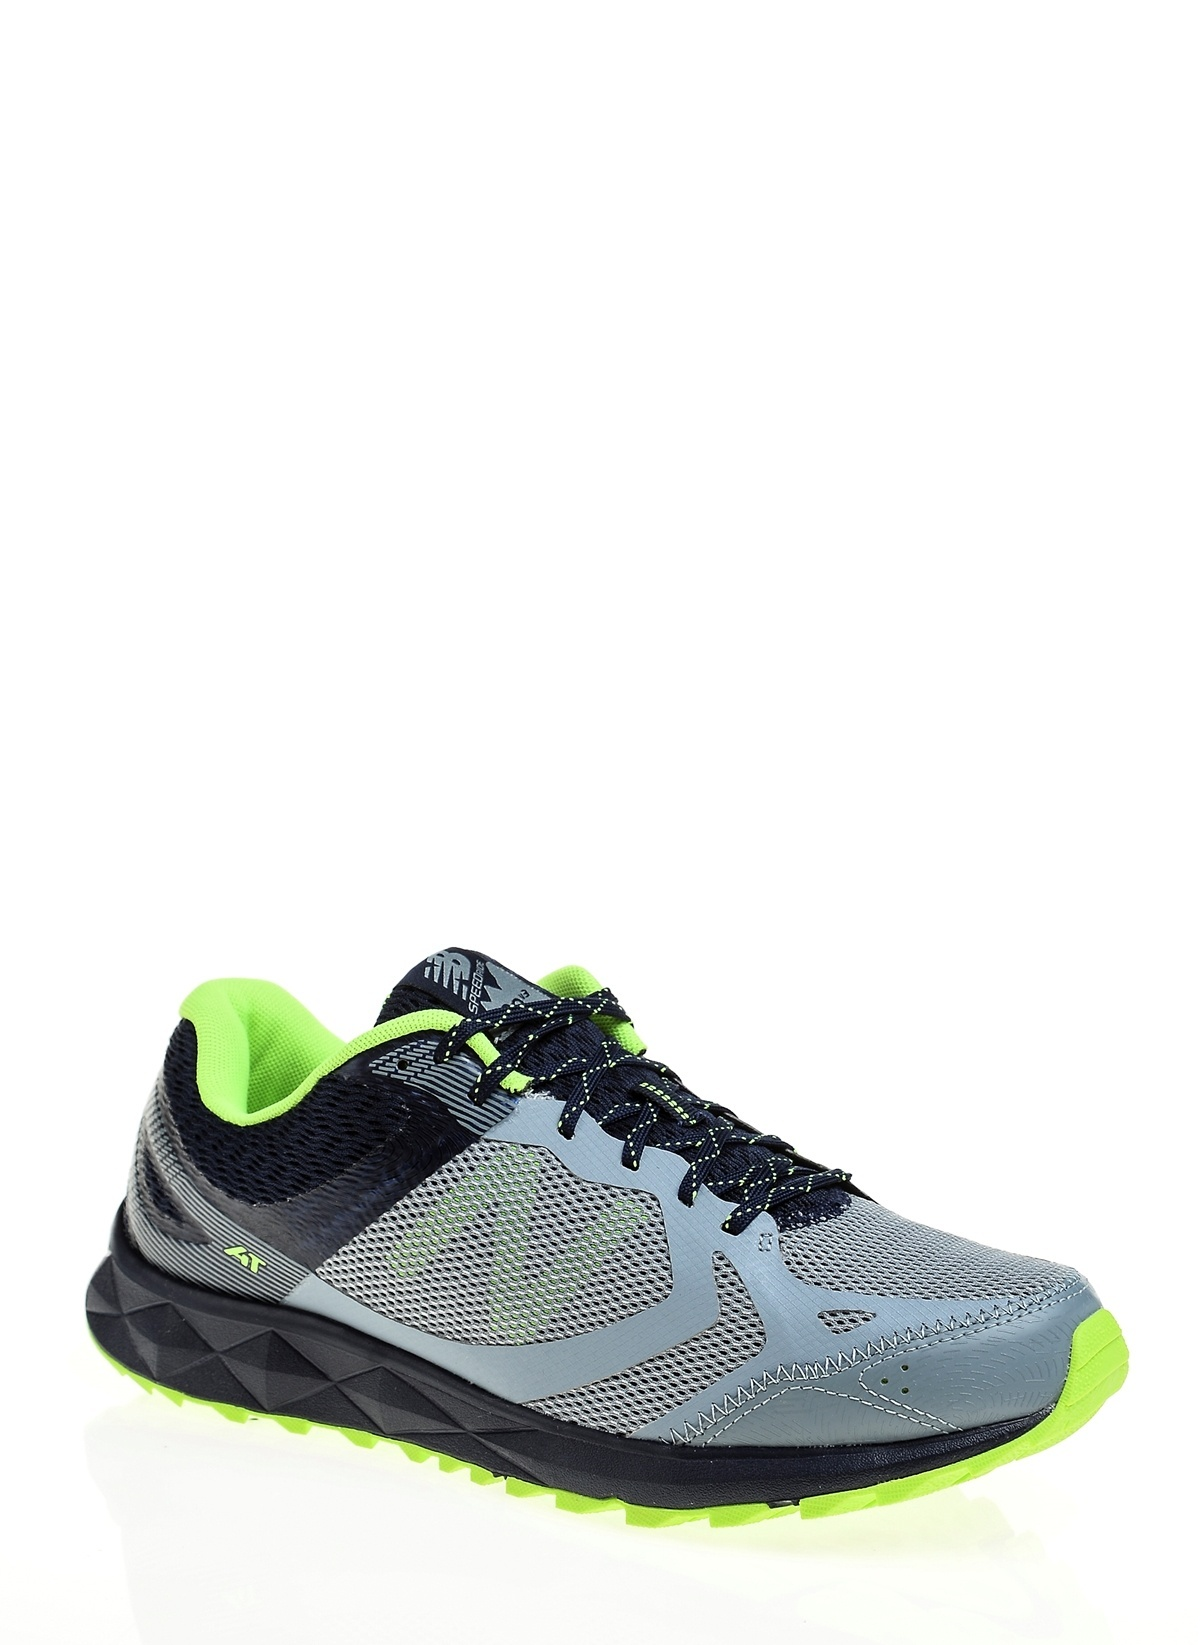 super popular ab489 c1847 MT590LC3-NB-Mens-Trail-Shoes